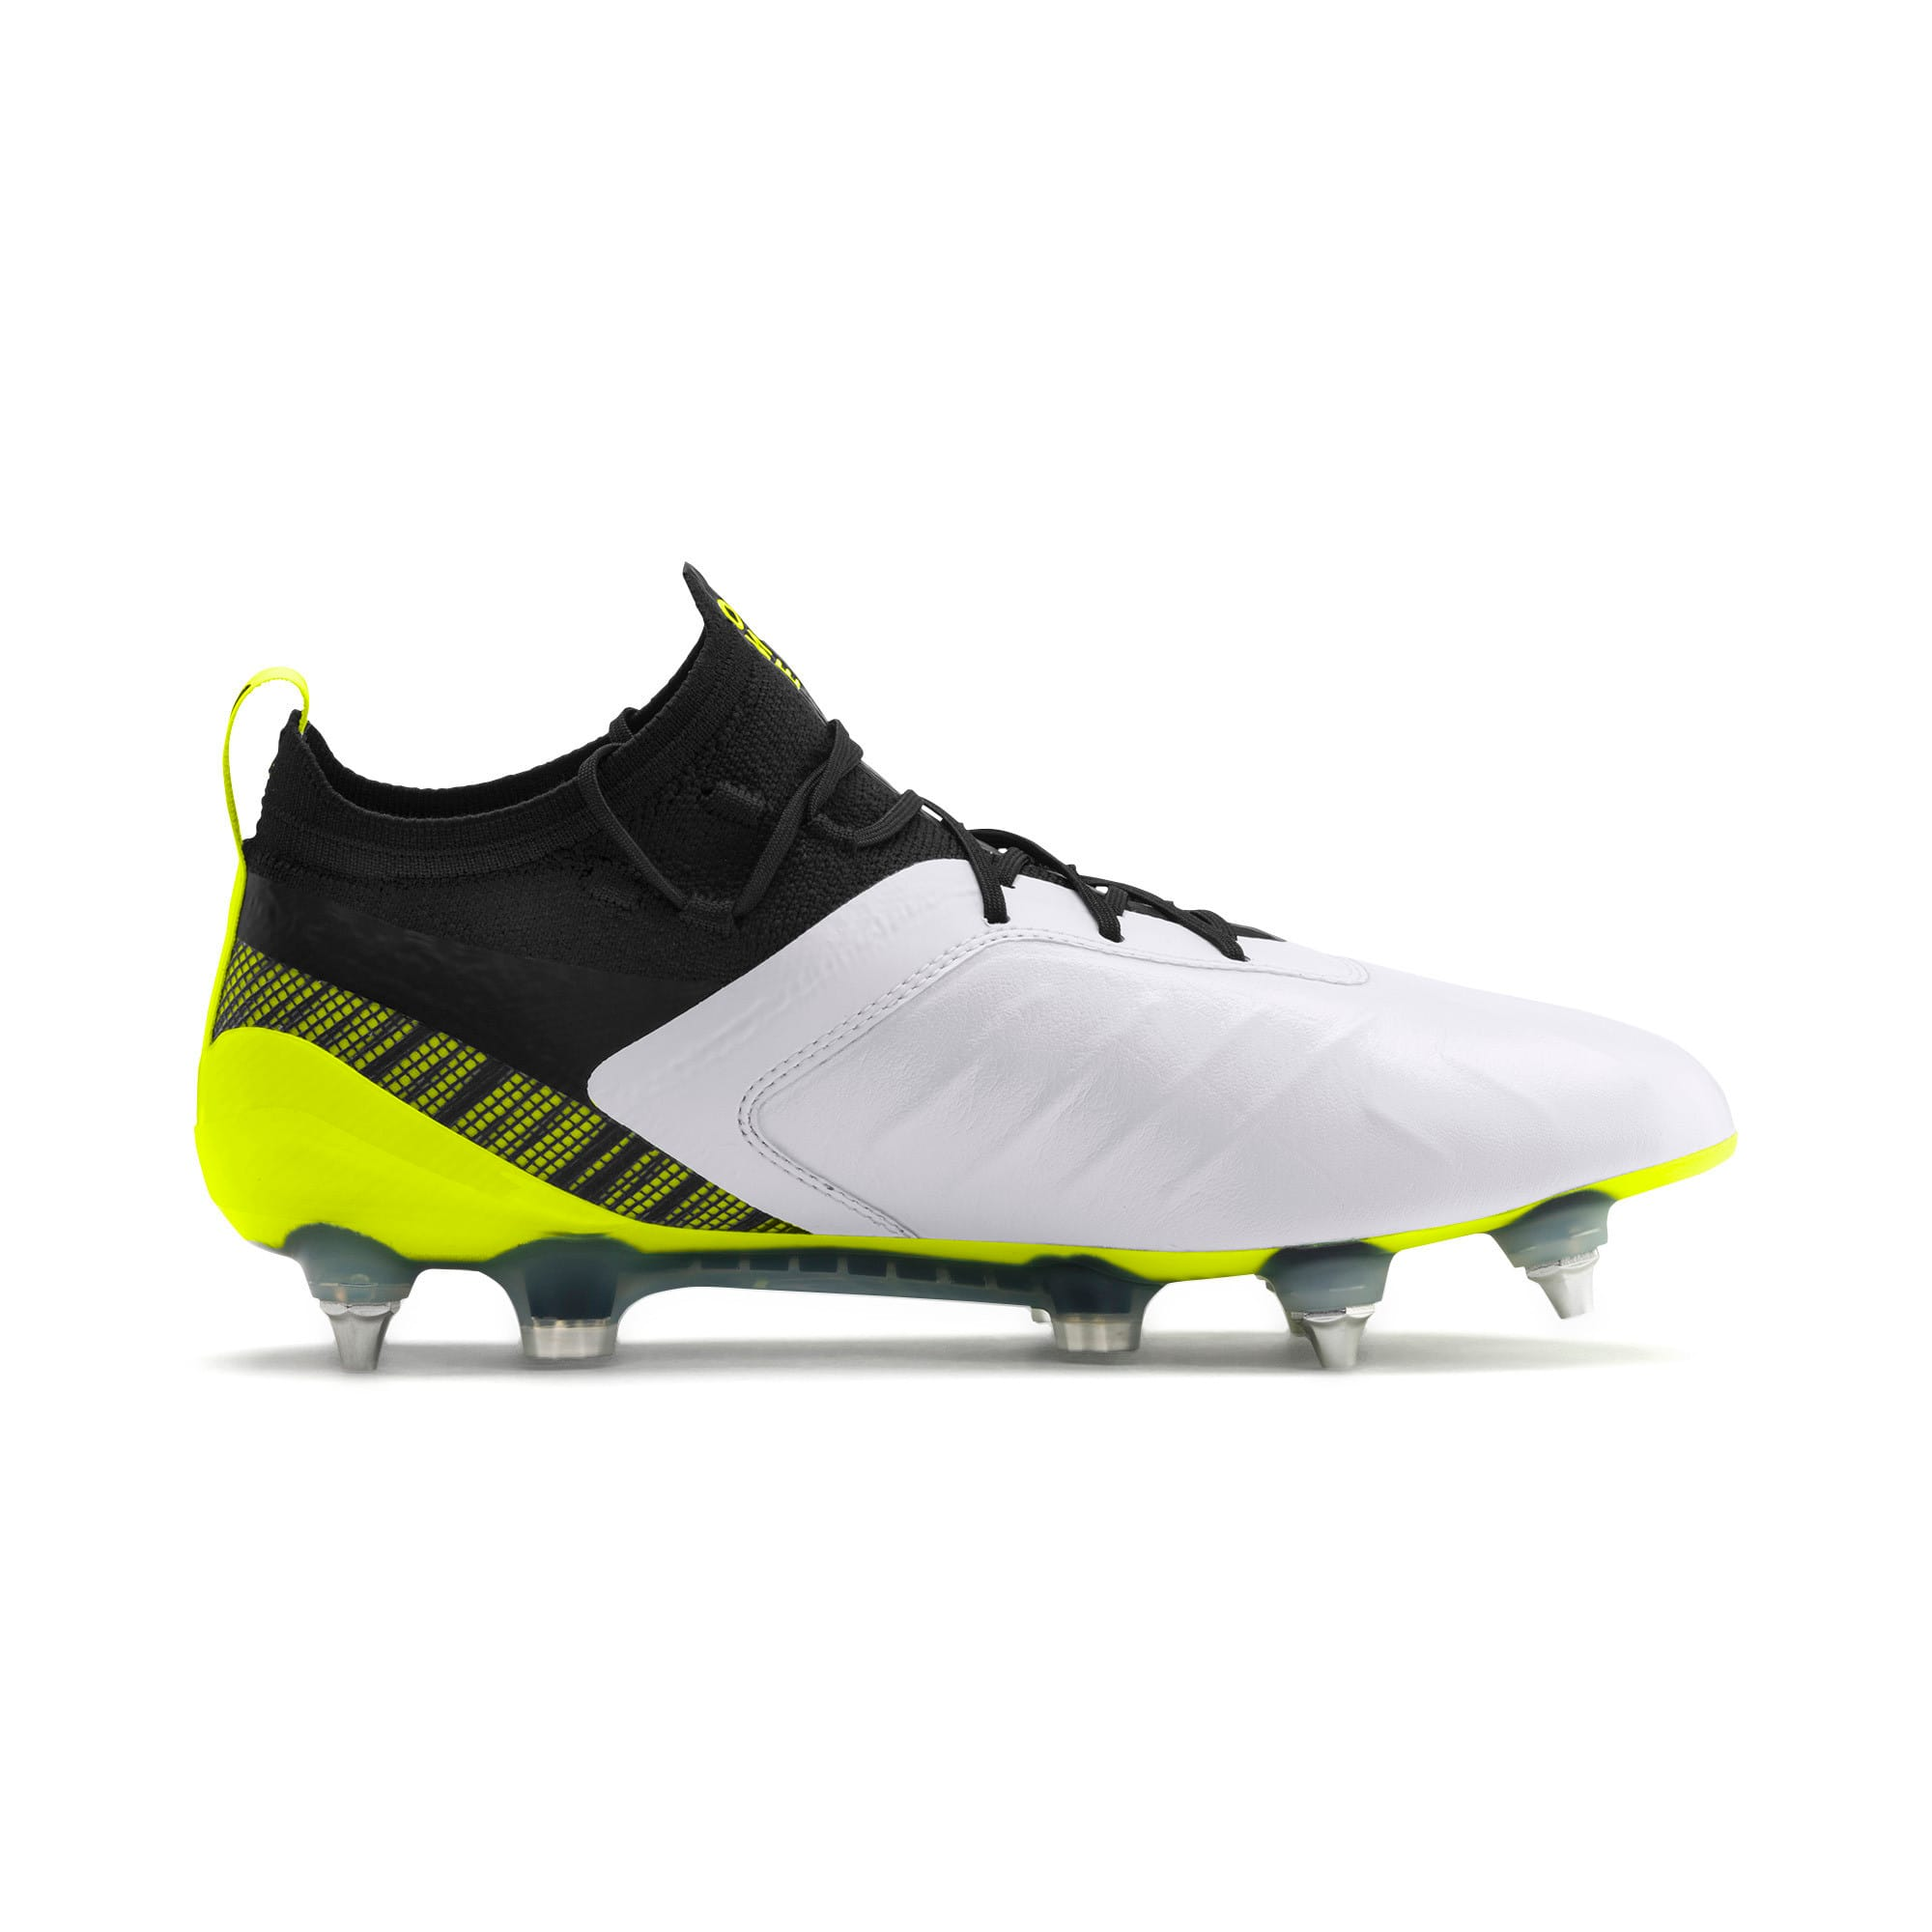 Thumbnail 6 of PUMA ONE 5.1 MxSG Football Boots, White-Black-Yellow Alert, medium